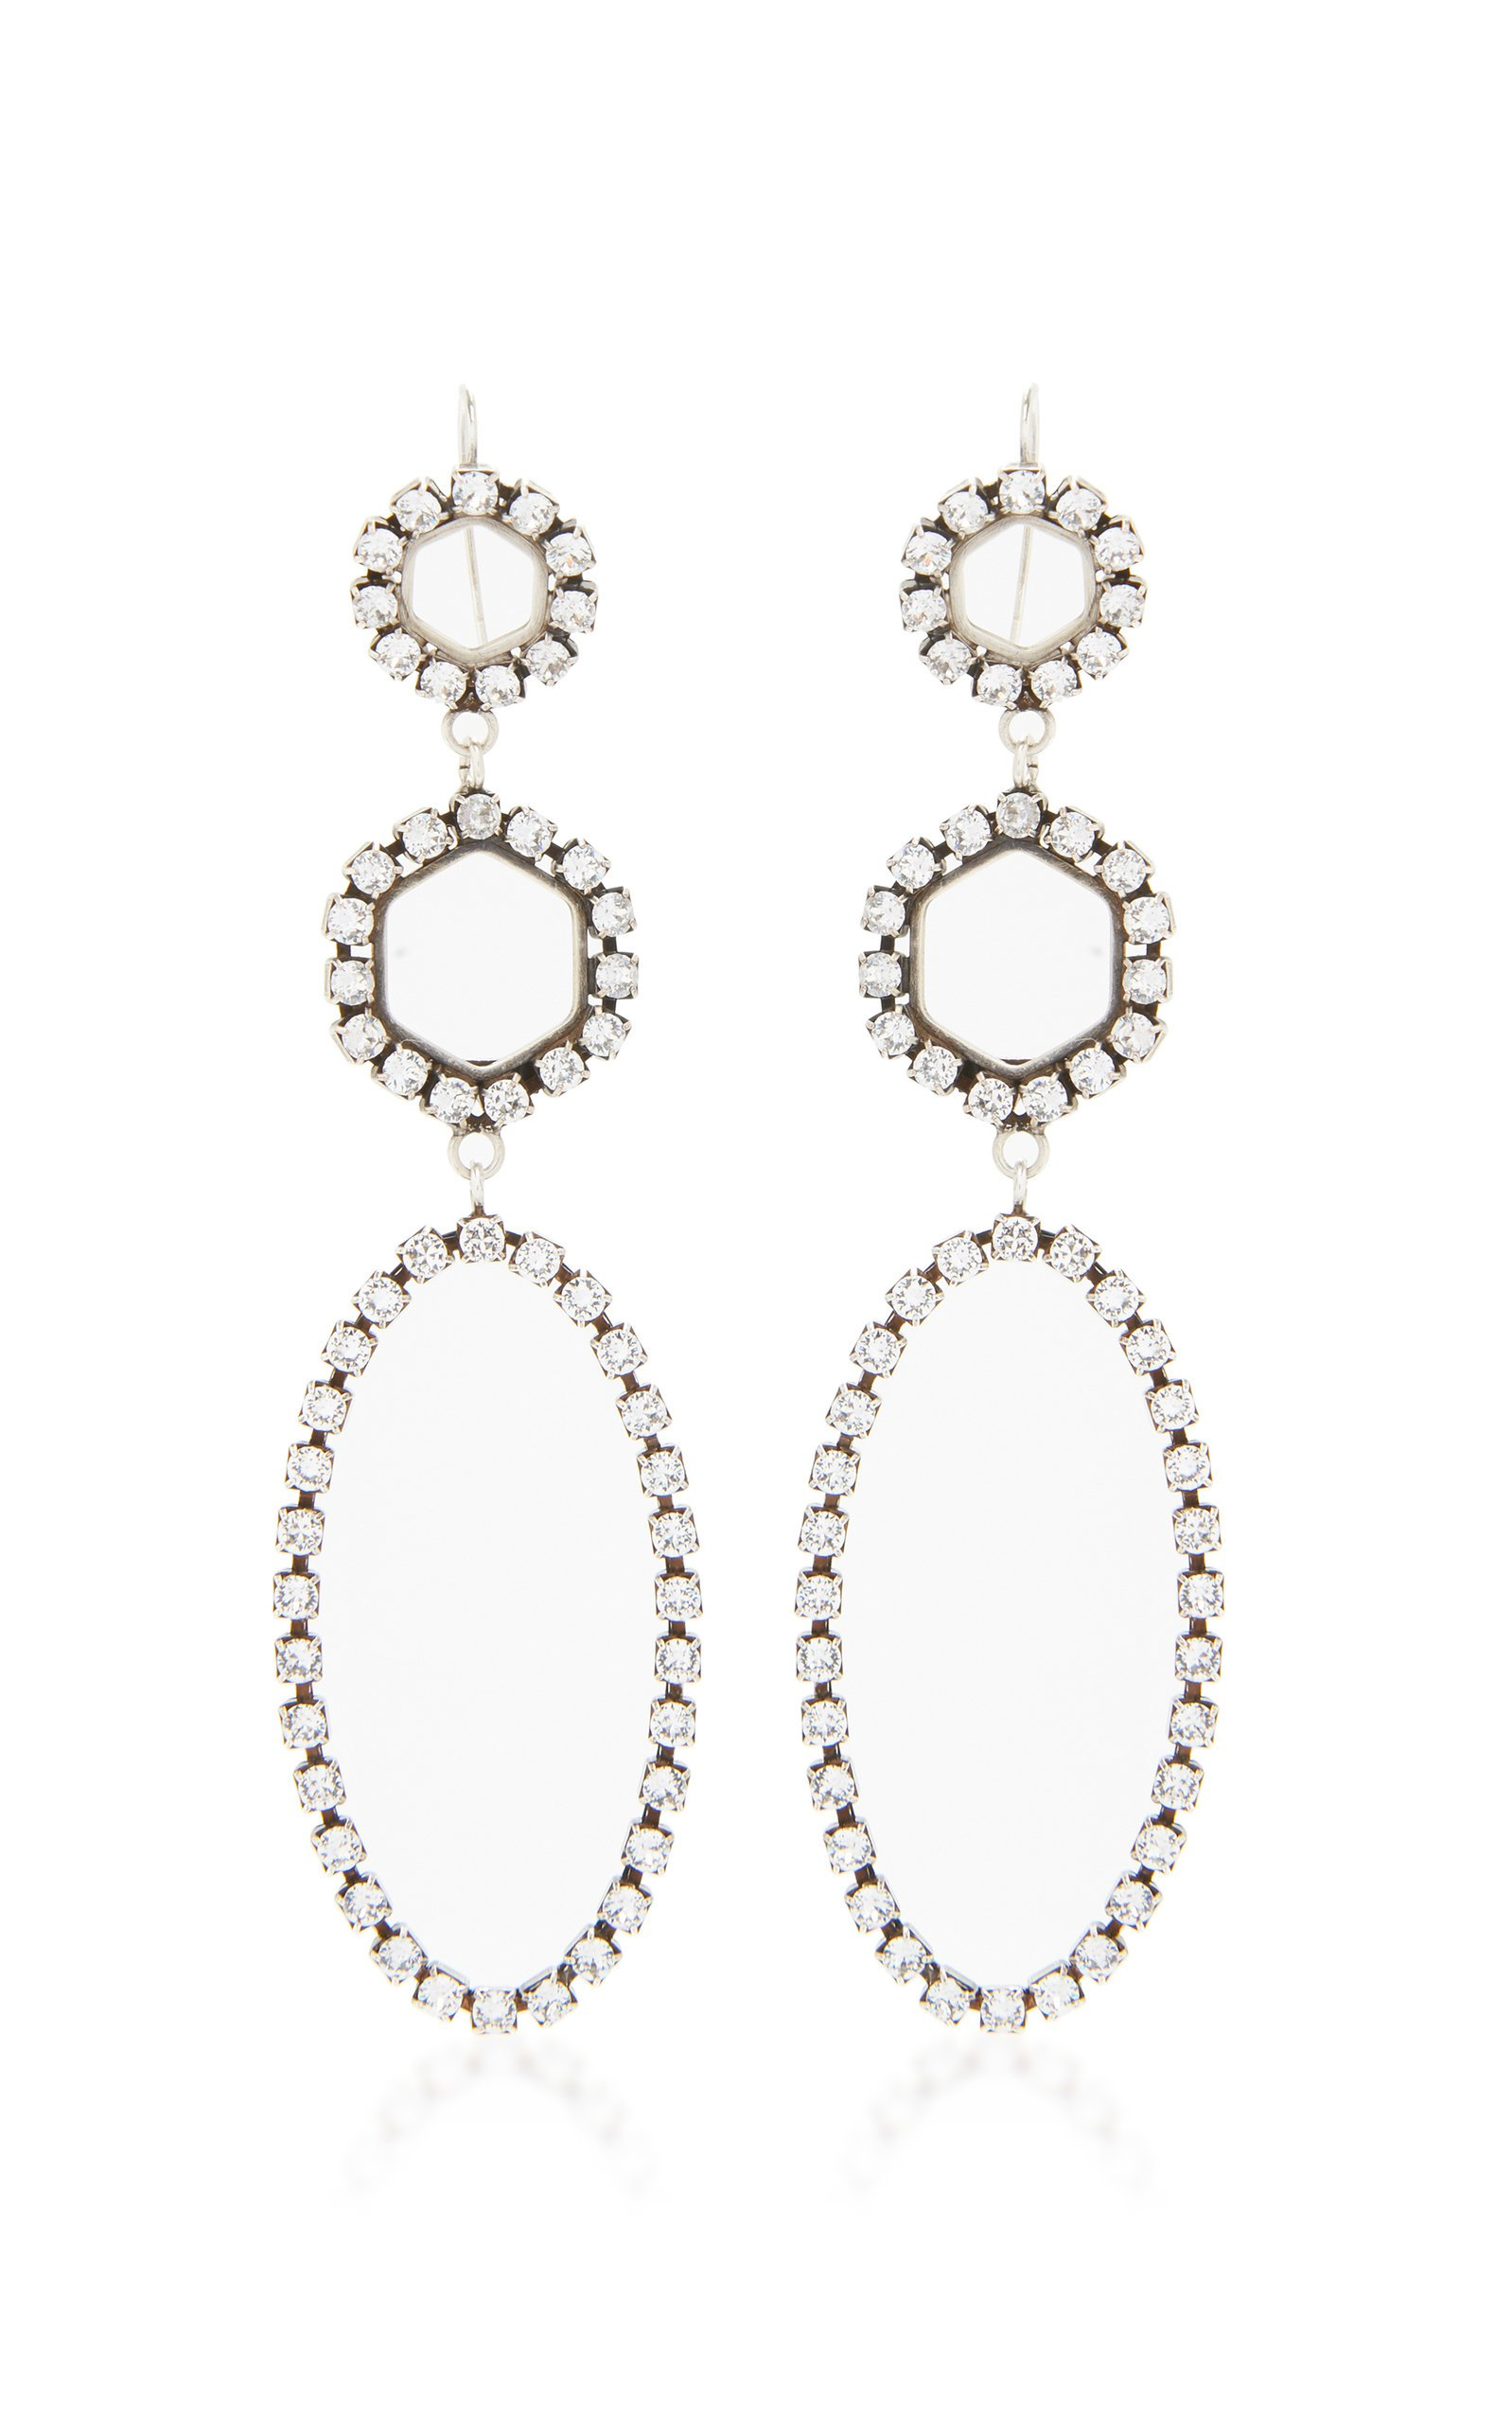 Silver-Tone Swarovski Crystal Earrings by Isabel Marant | Moda Operandi